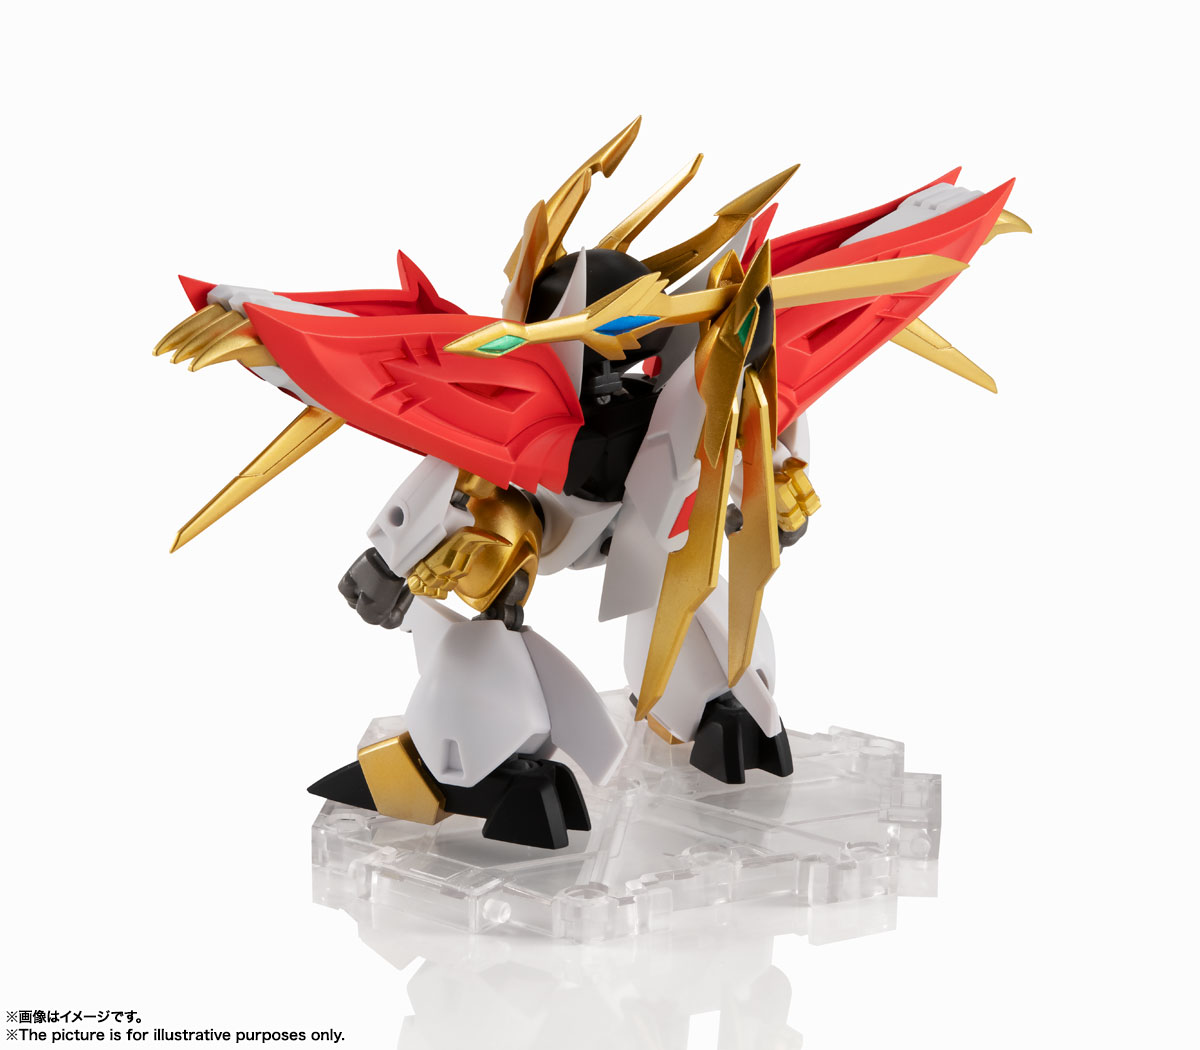 NXEDGE STYLE[MASHIN UNIT]『煌龍丸』魔神英雄伝ワタル 可動フィギュア-002